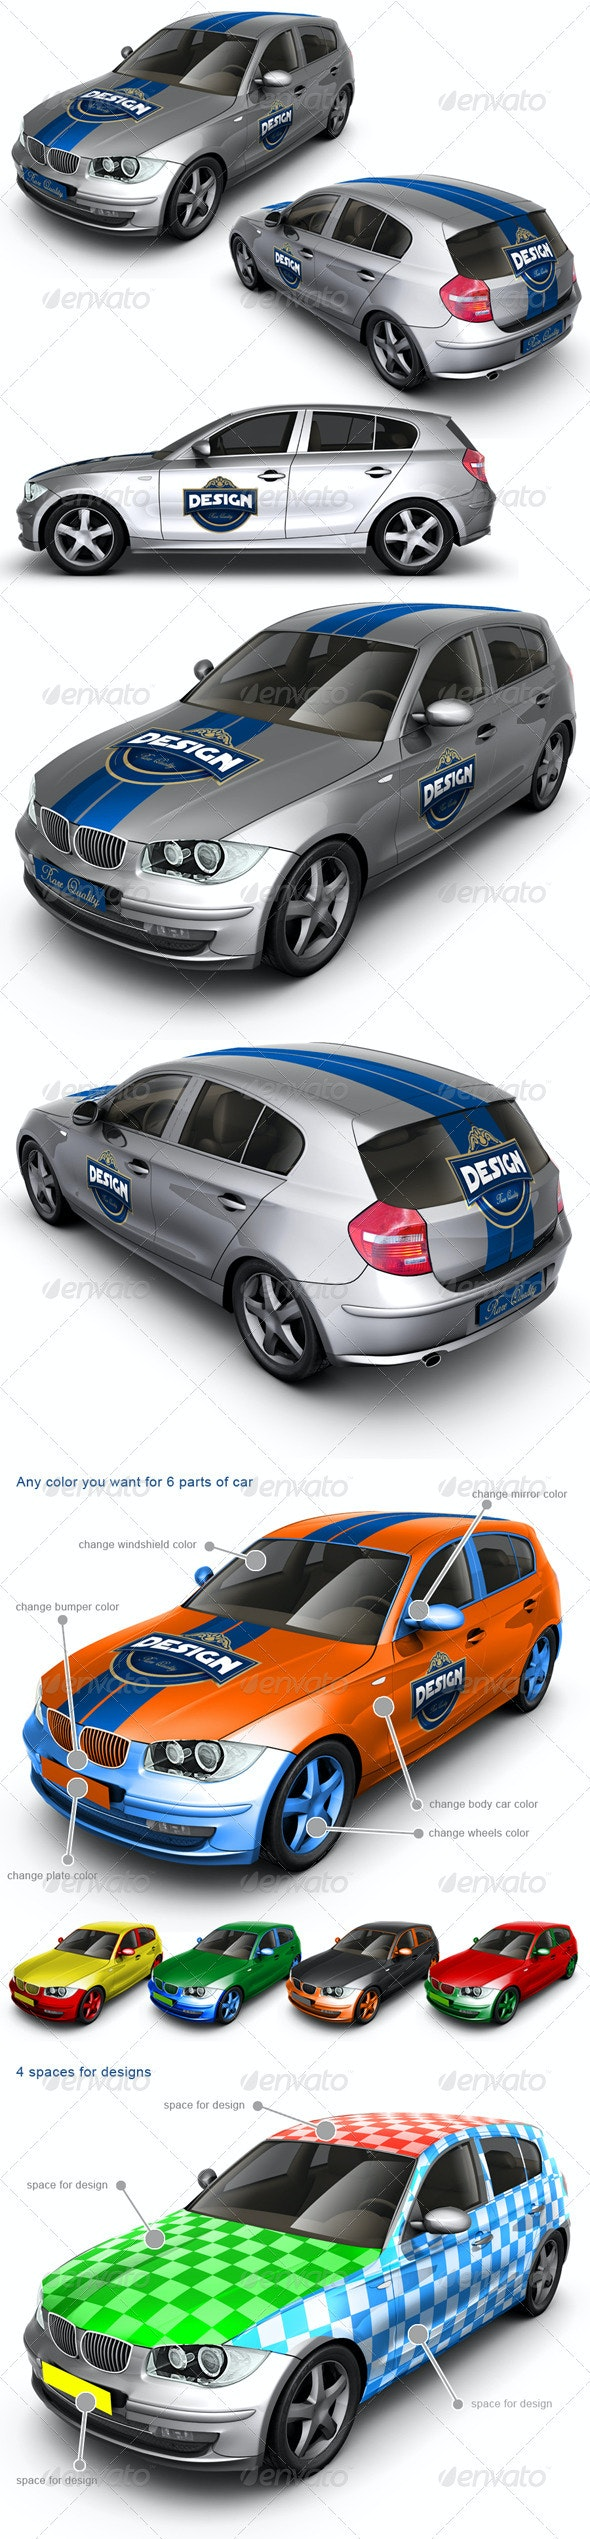 Executive/Family Car Mock Up - Vehicle Wraps Print